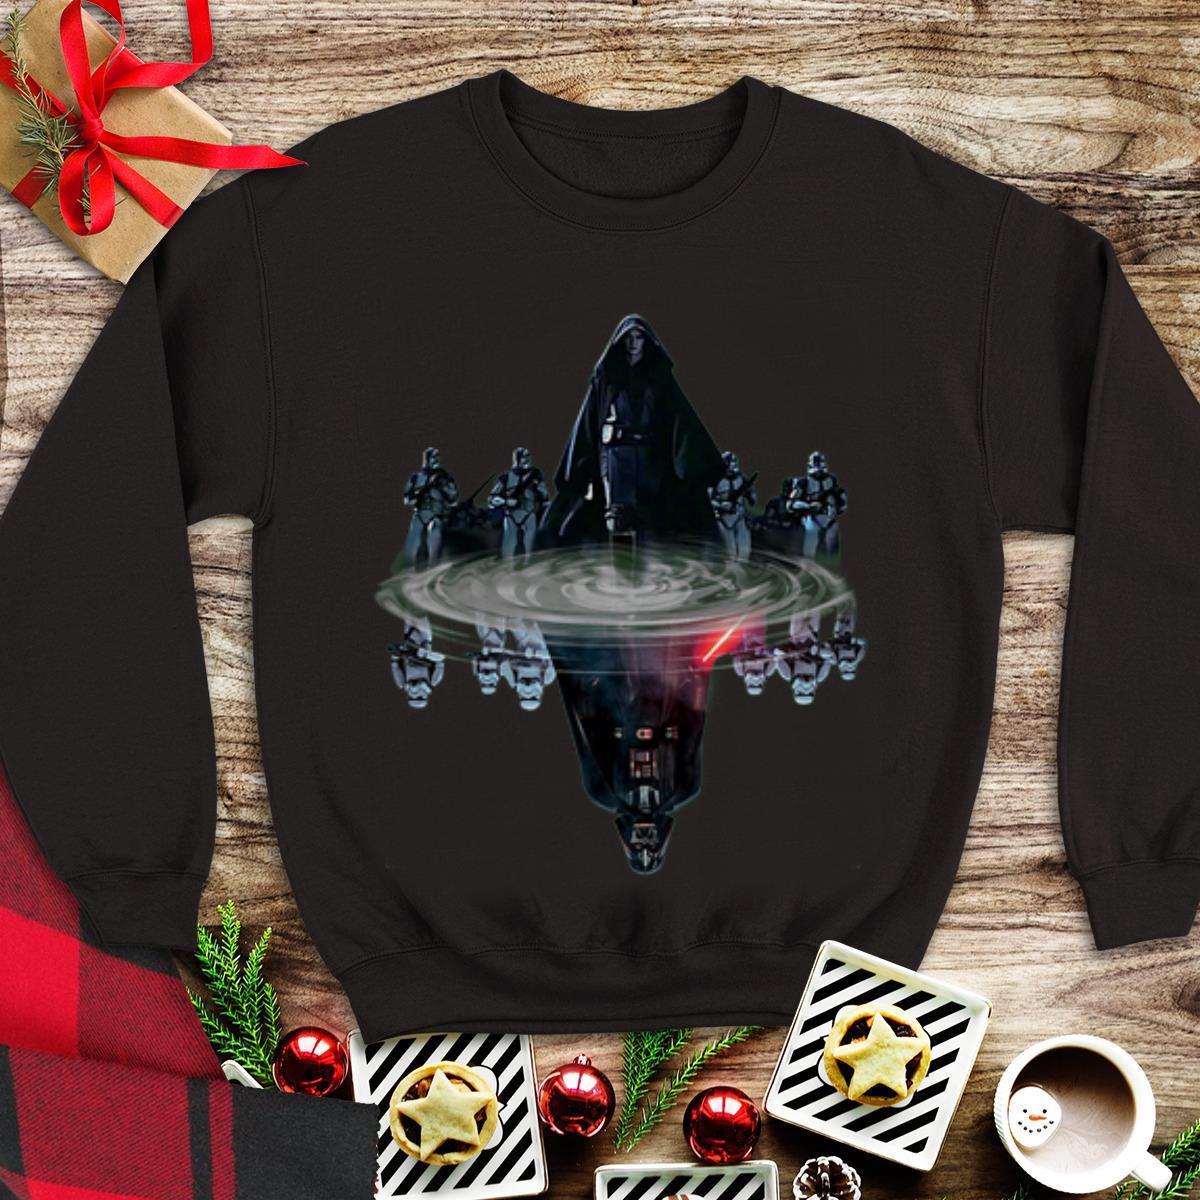 Awesome Star Wars Dark Vader Reflection Mirror Water shirt